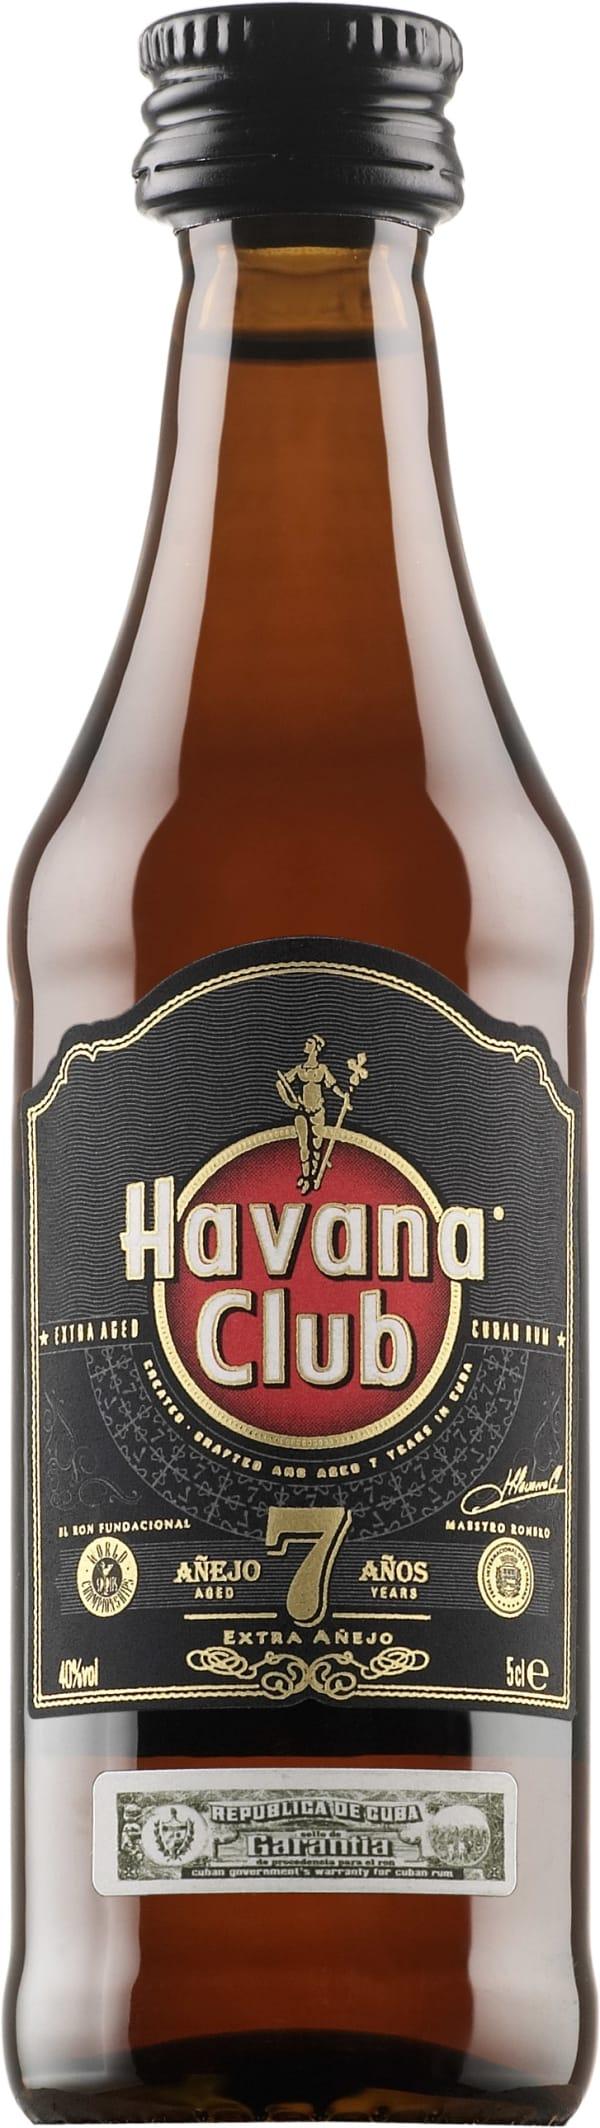 Havana Club Añejo 7 Años  plastflaska